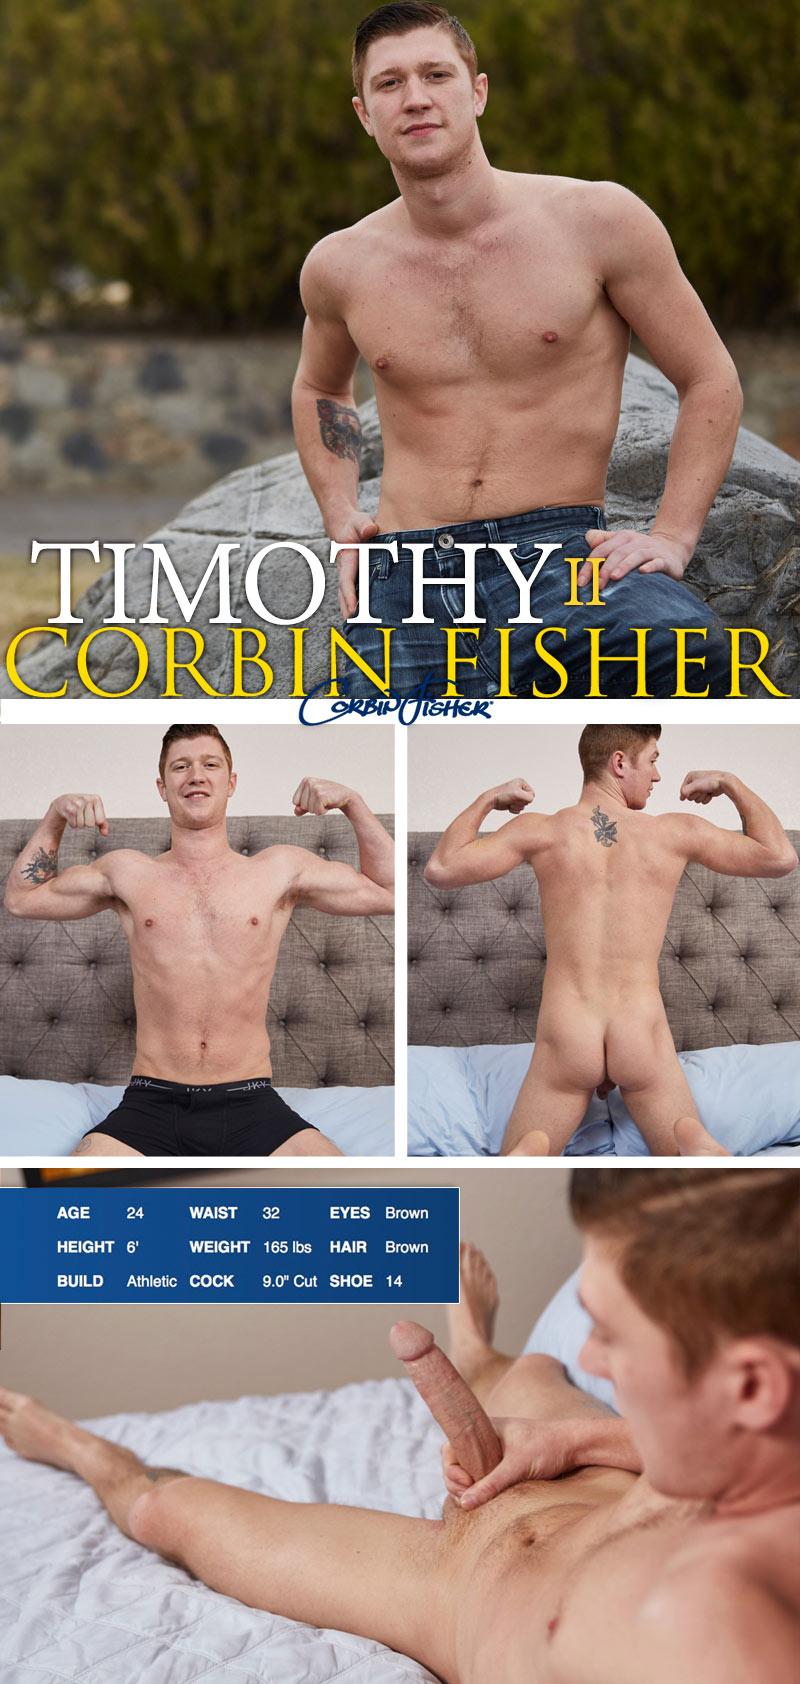 Timothy (II) at CorbinFisher